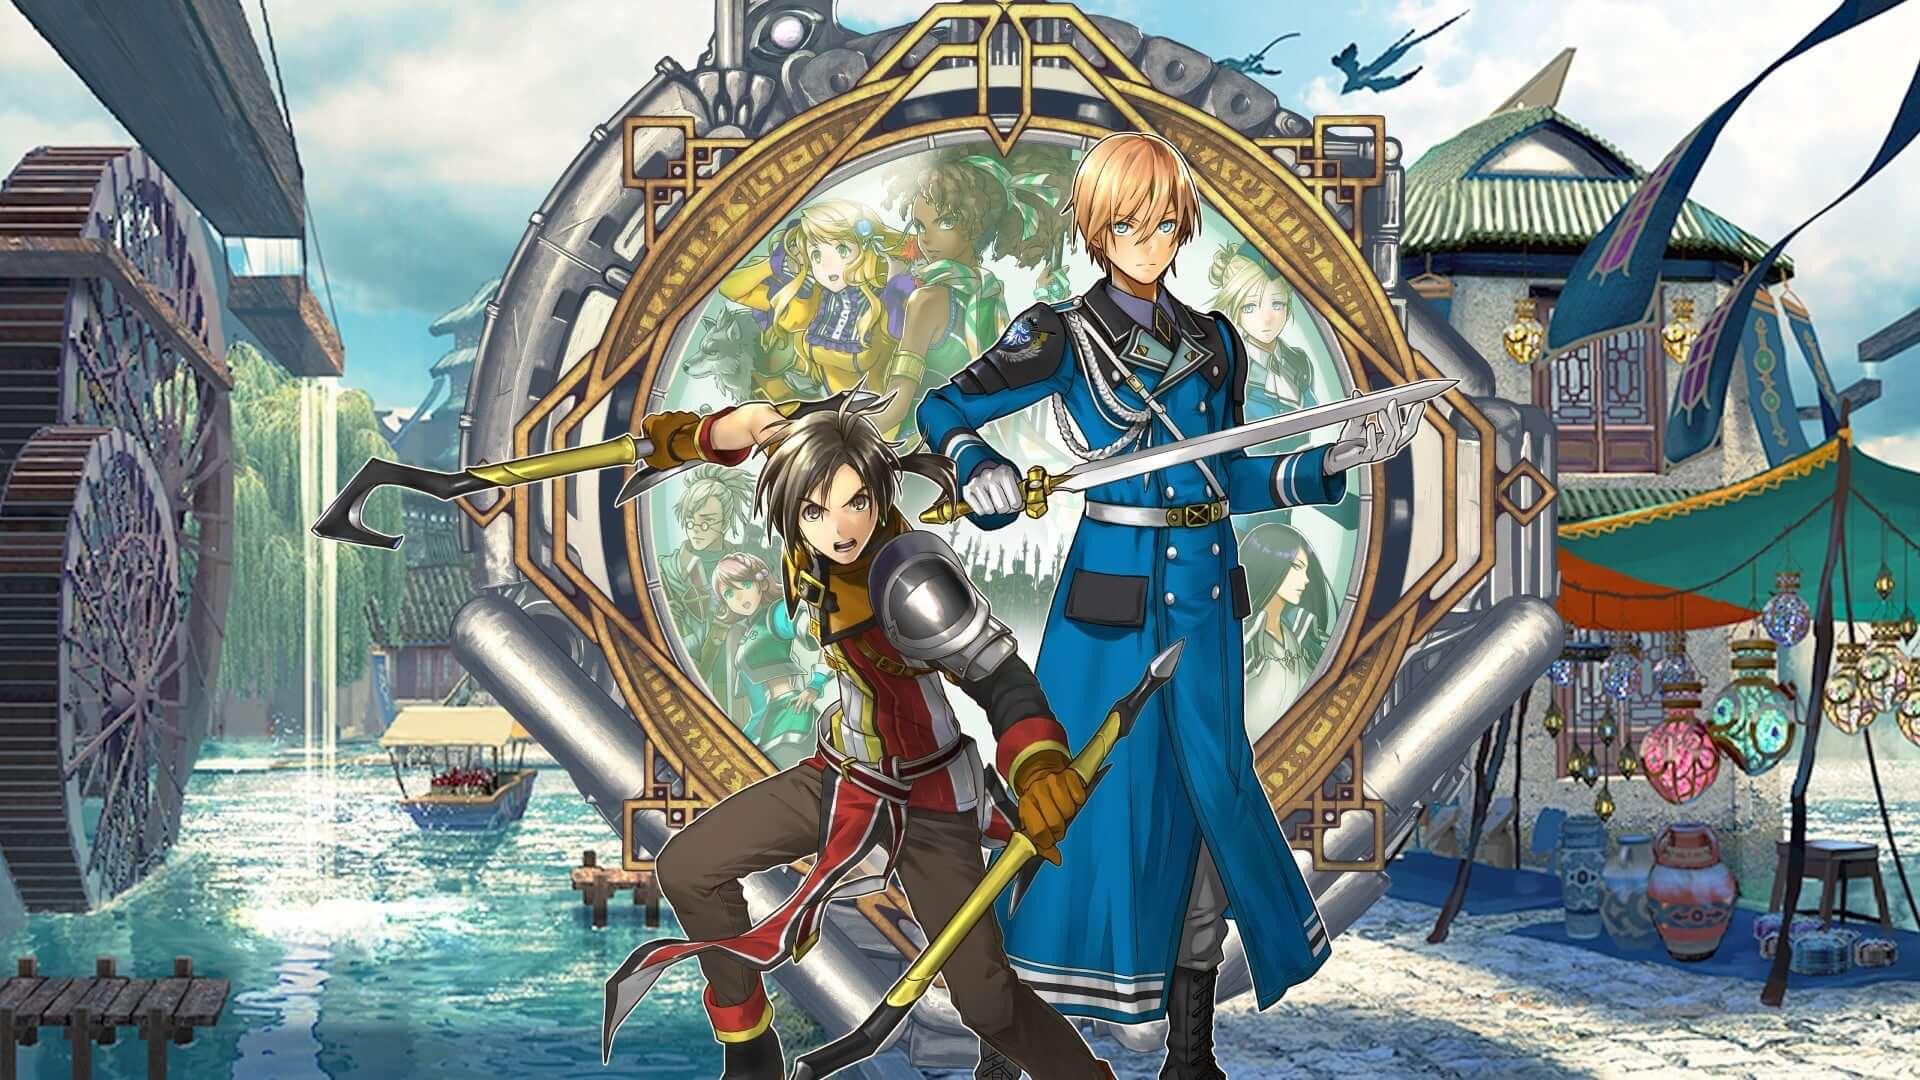 Eiyuden Chronicle, sucesor espiritual de Suikoden, tendrá un ligero retraso para expandir el juego